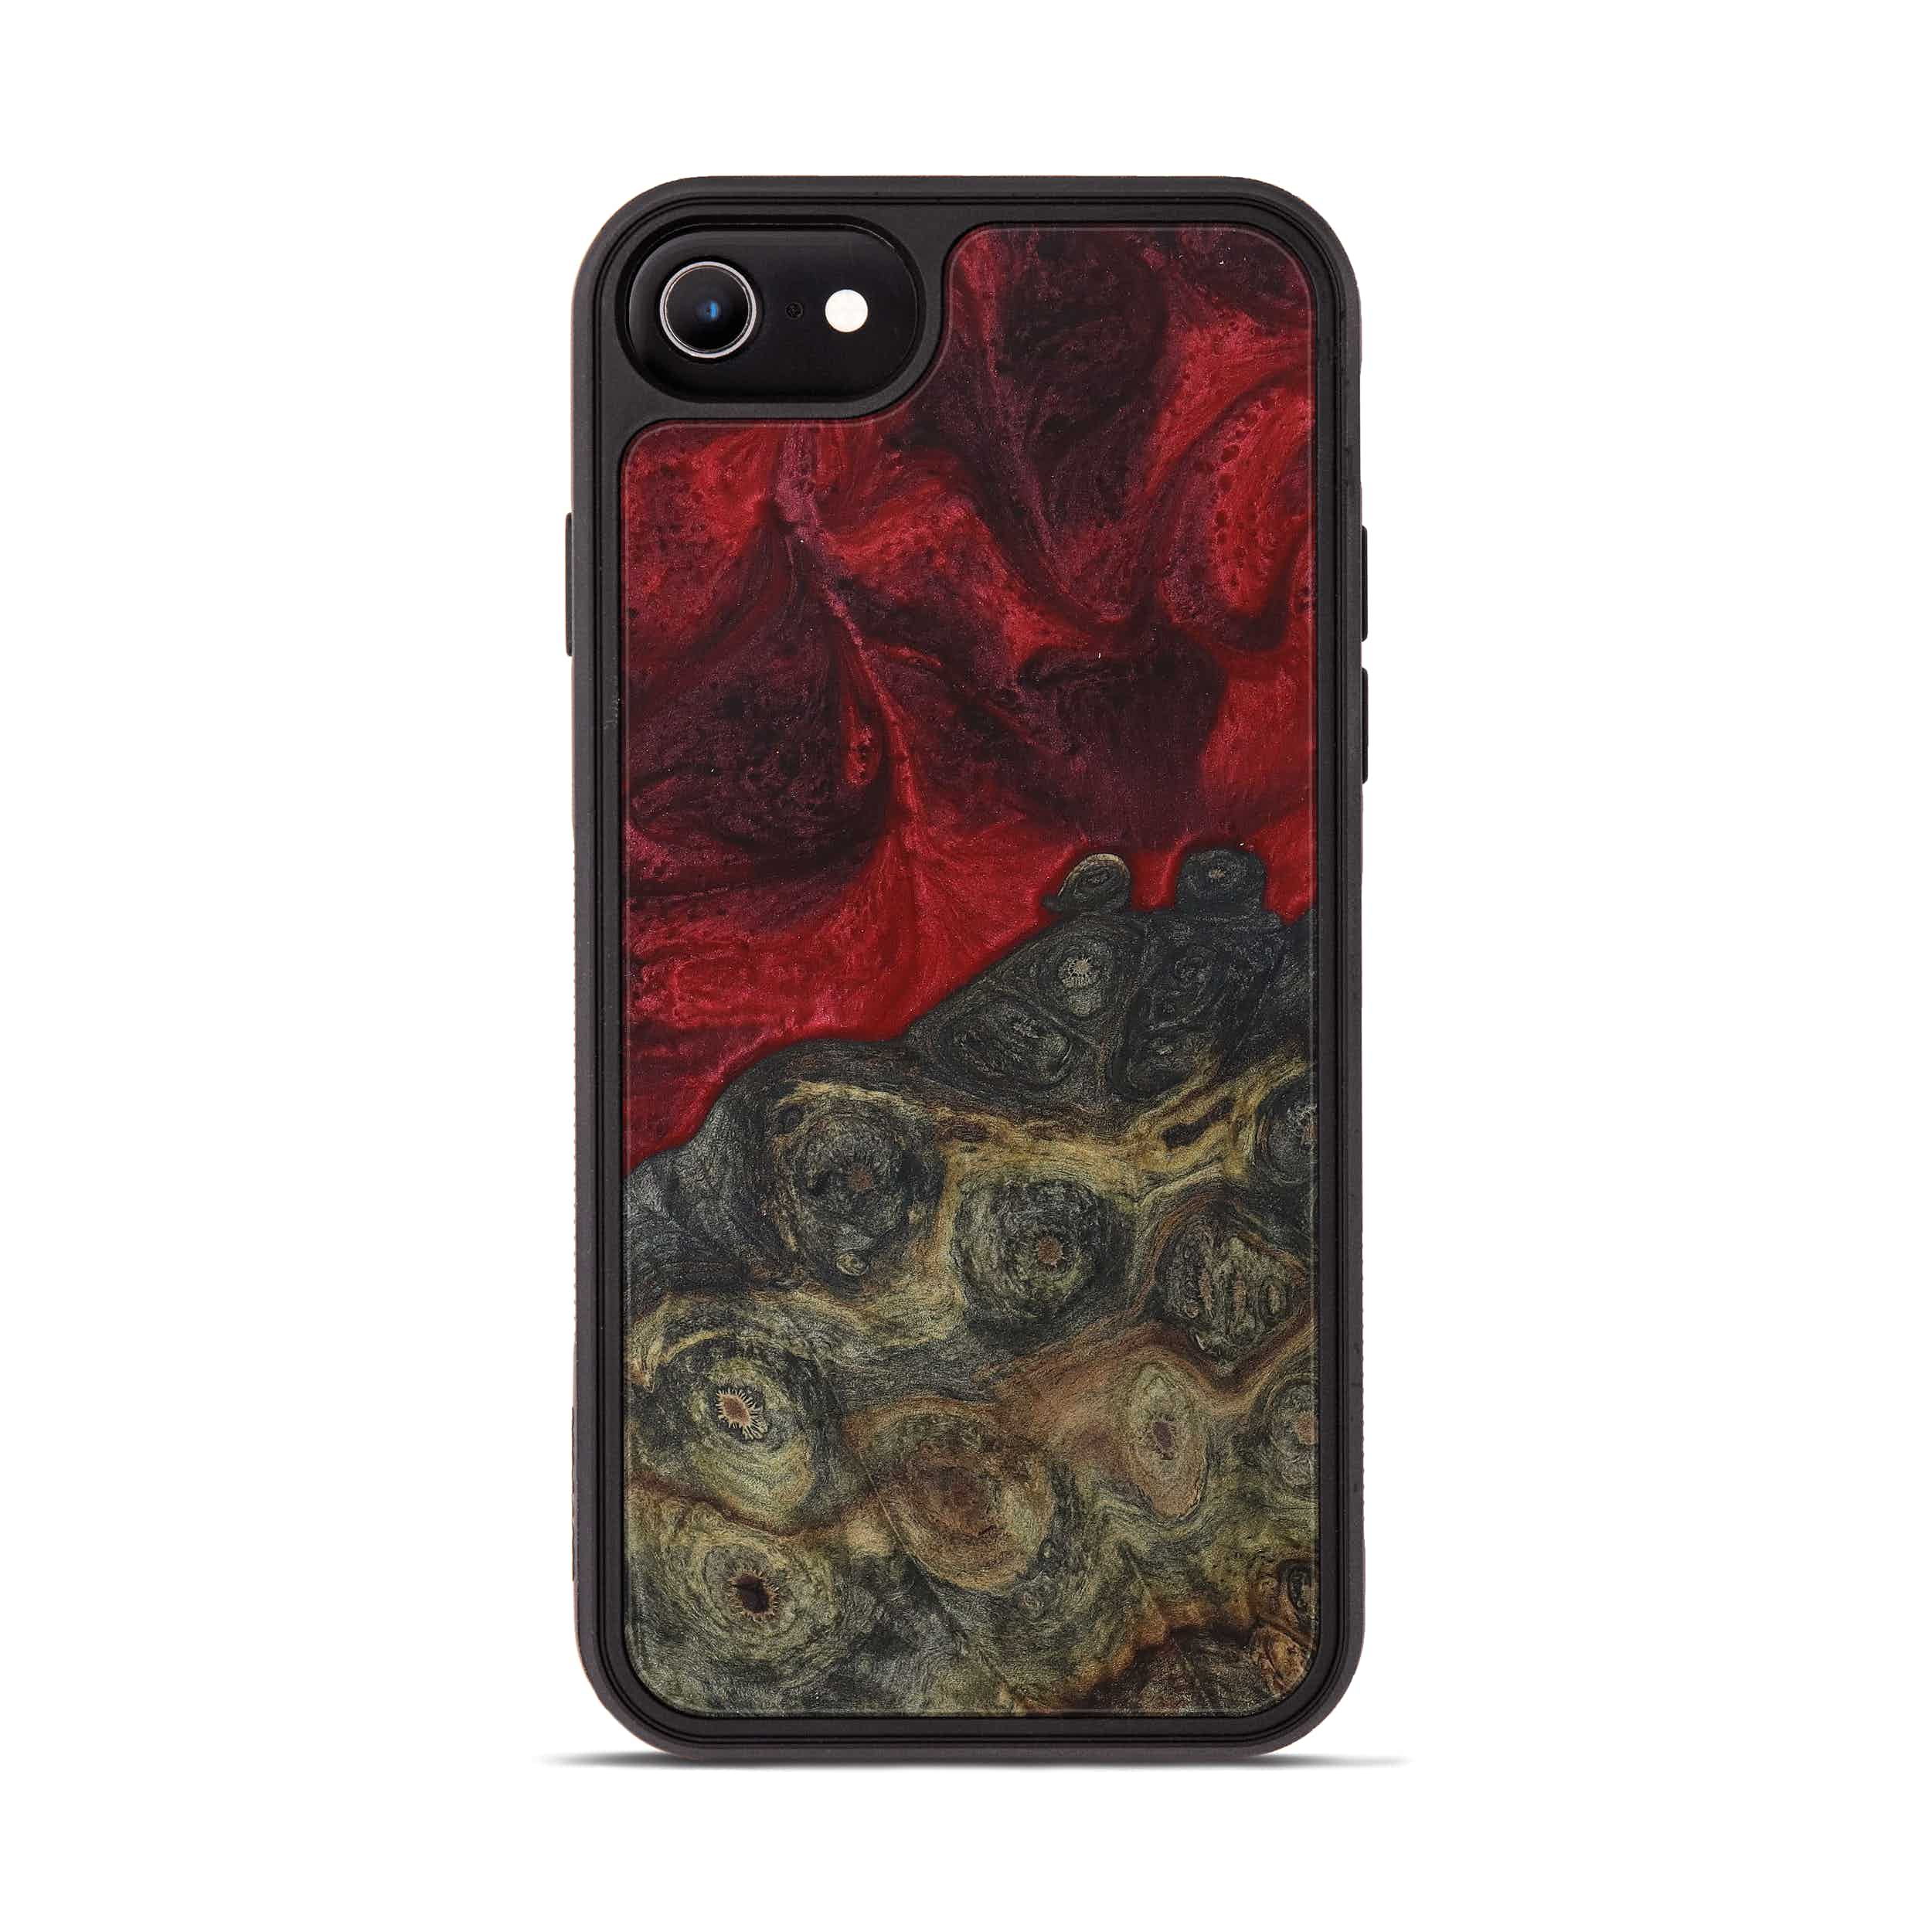 iPhone 6s Wood+Resin Phone Case - Auria (Dark Red, 395937)